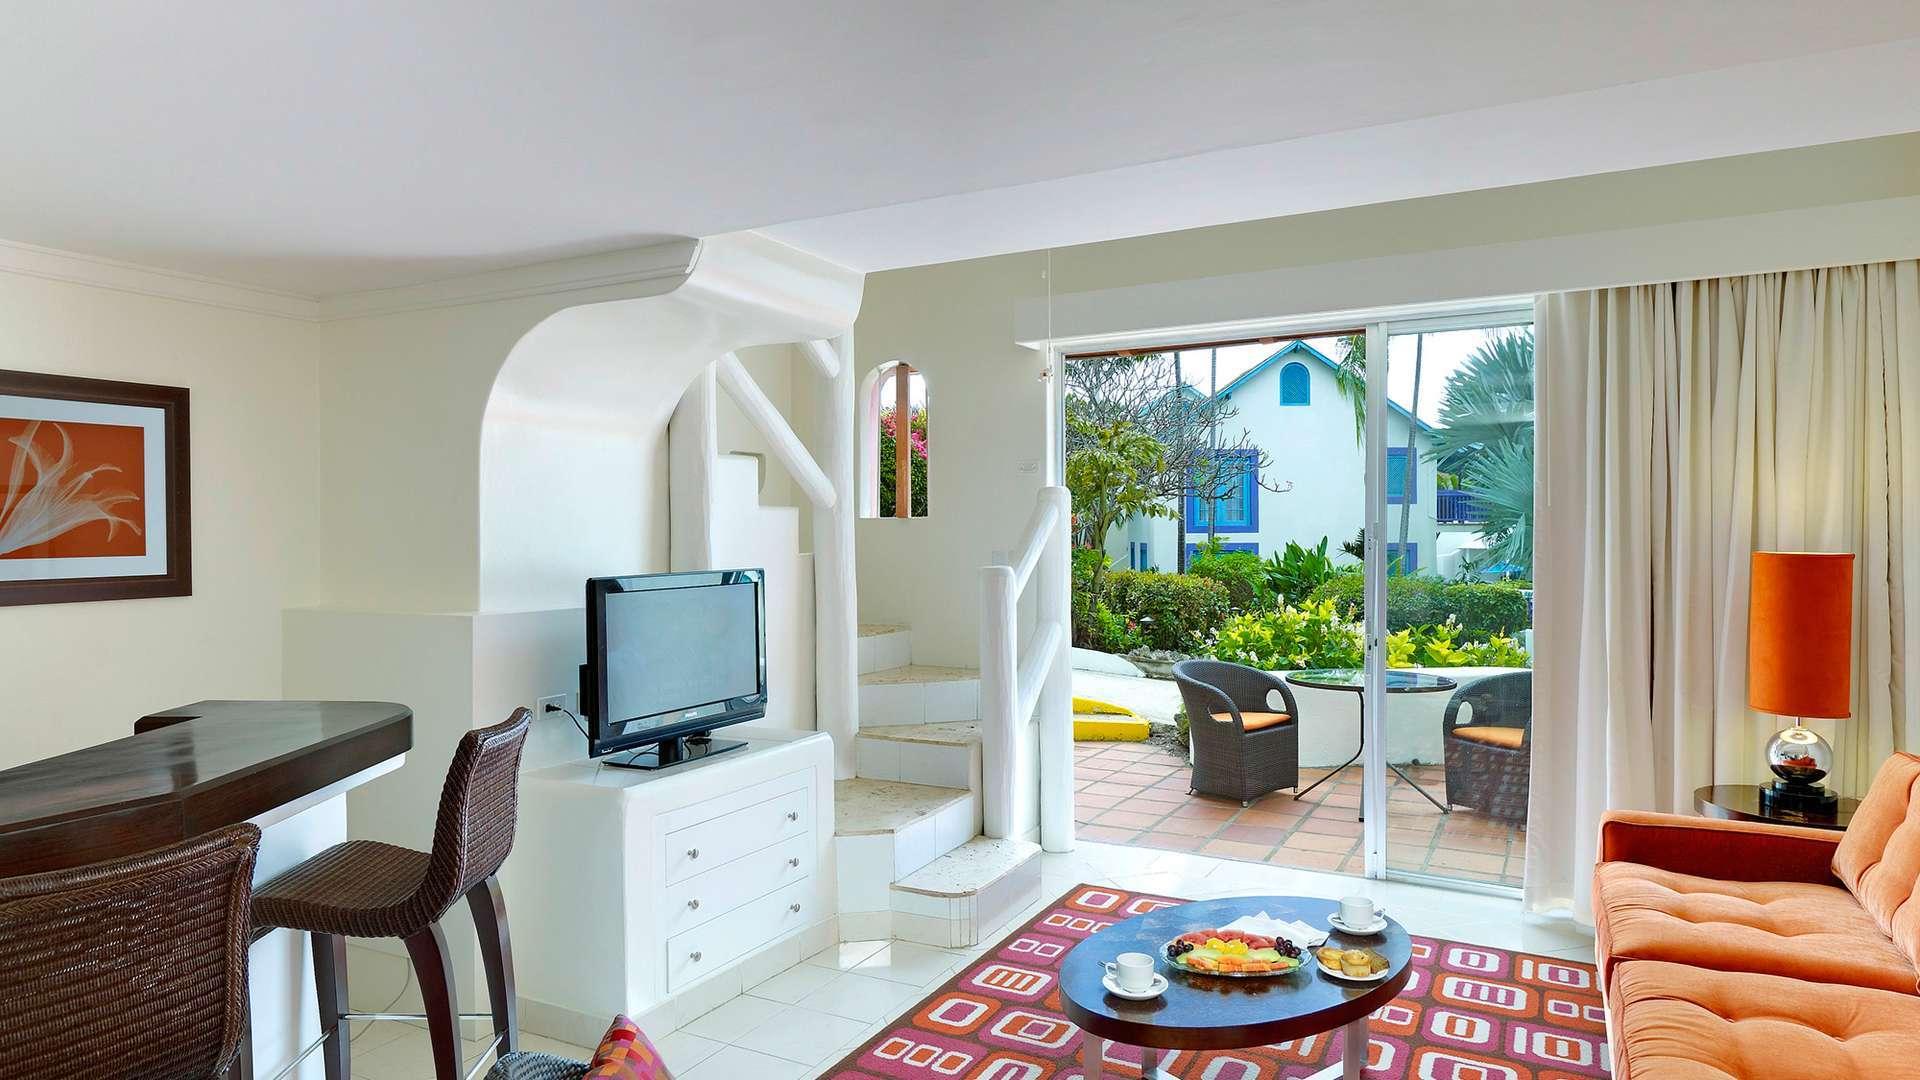 Asia Garten Ottobrunn Inspirierend Room Details for Crystal Cove by Elegant Hotels A Hotel